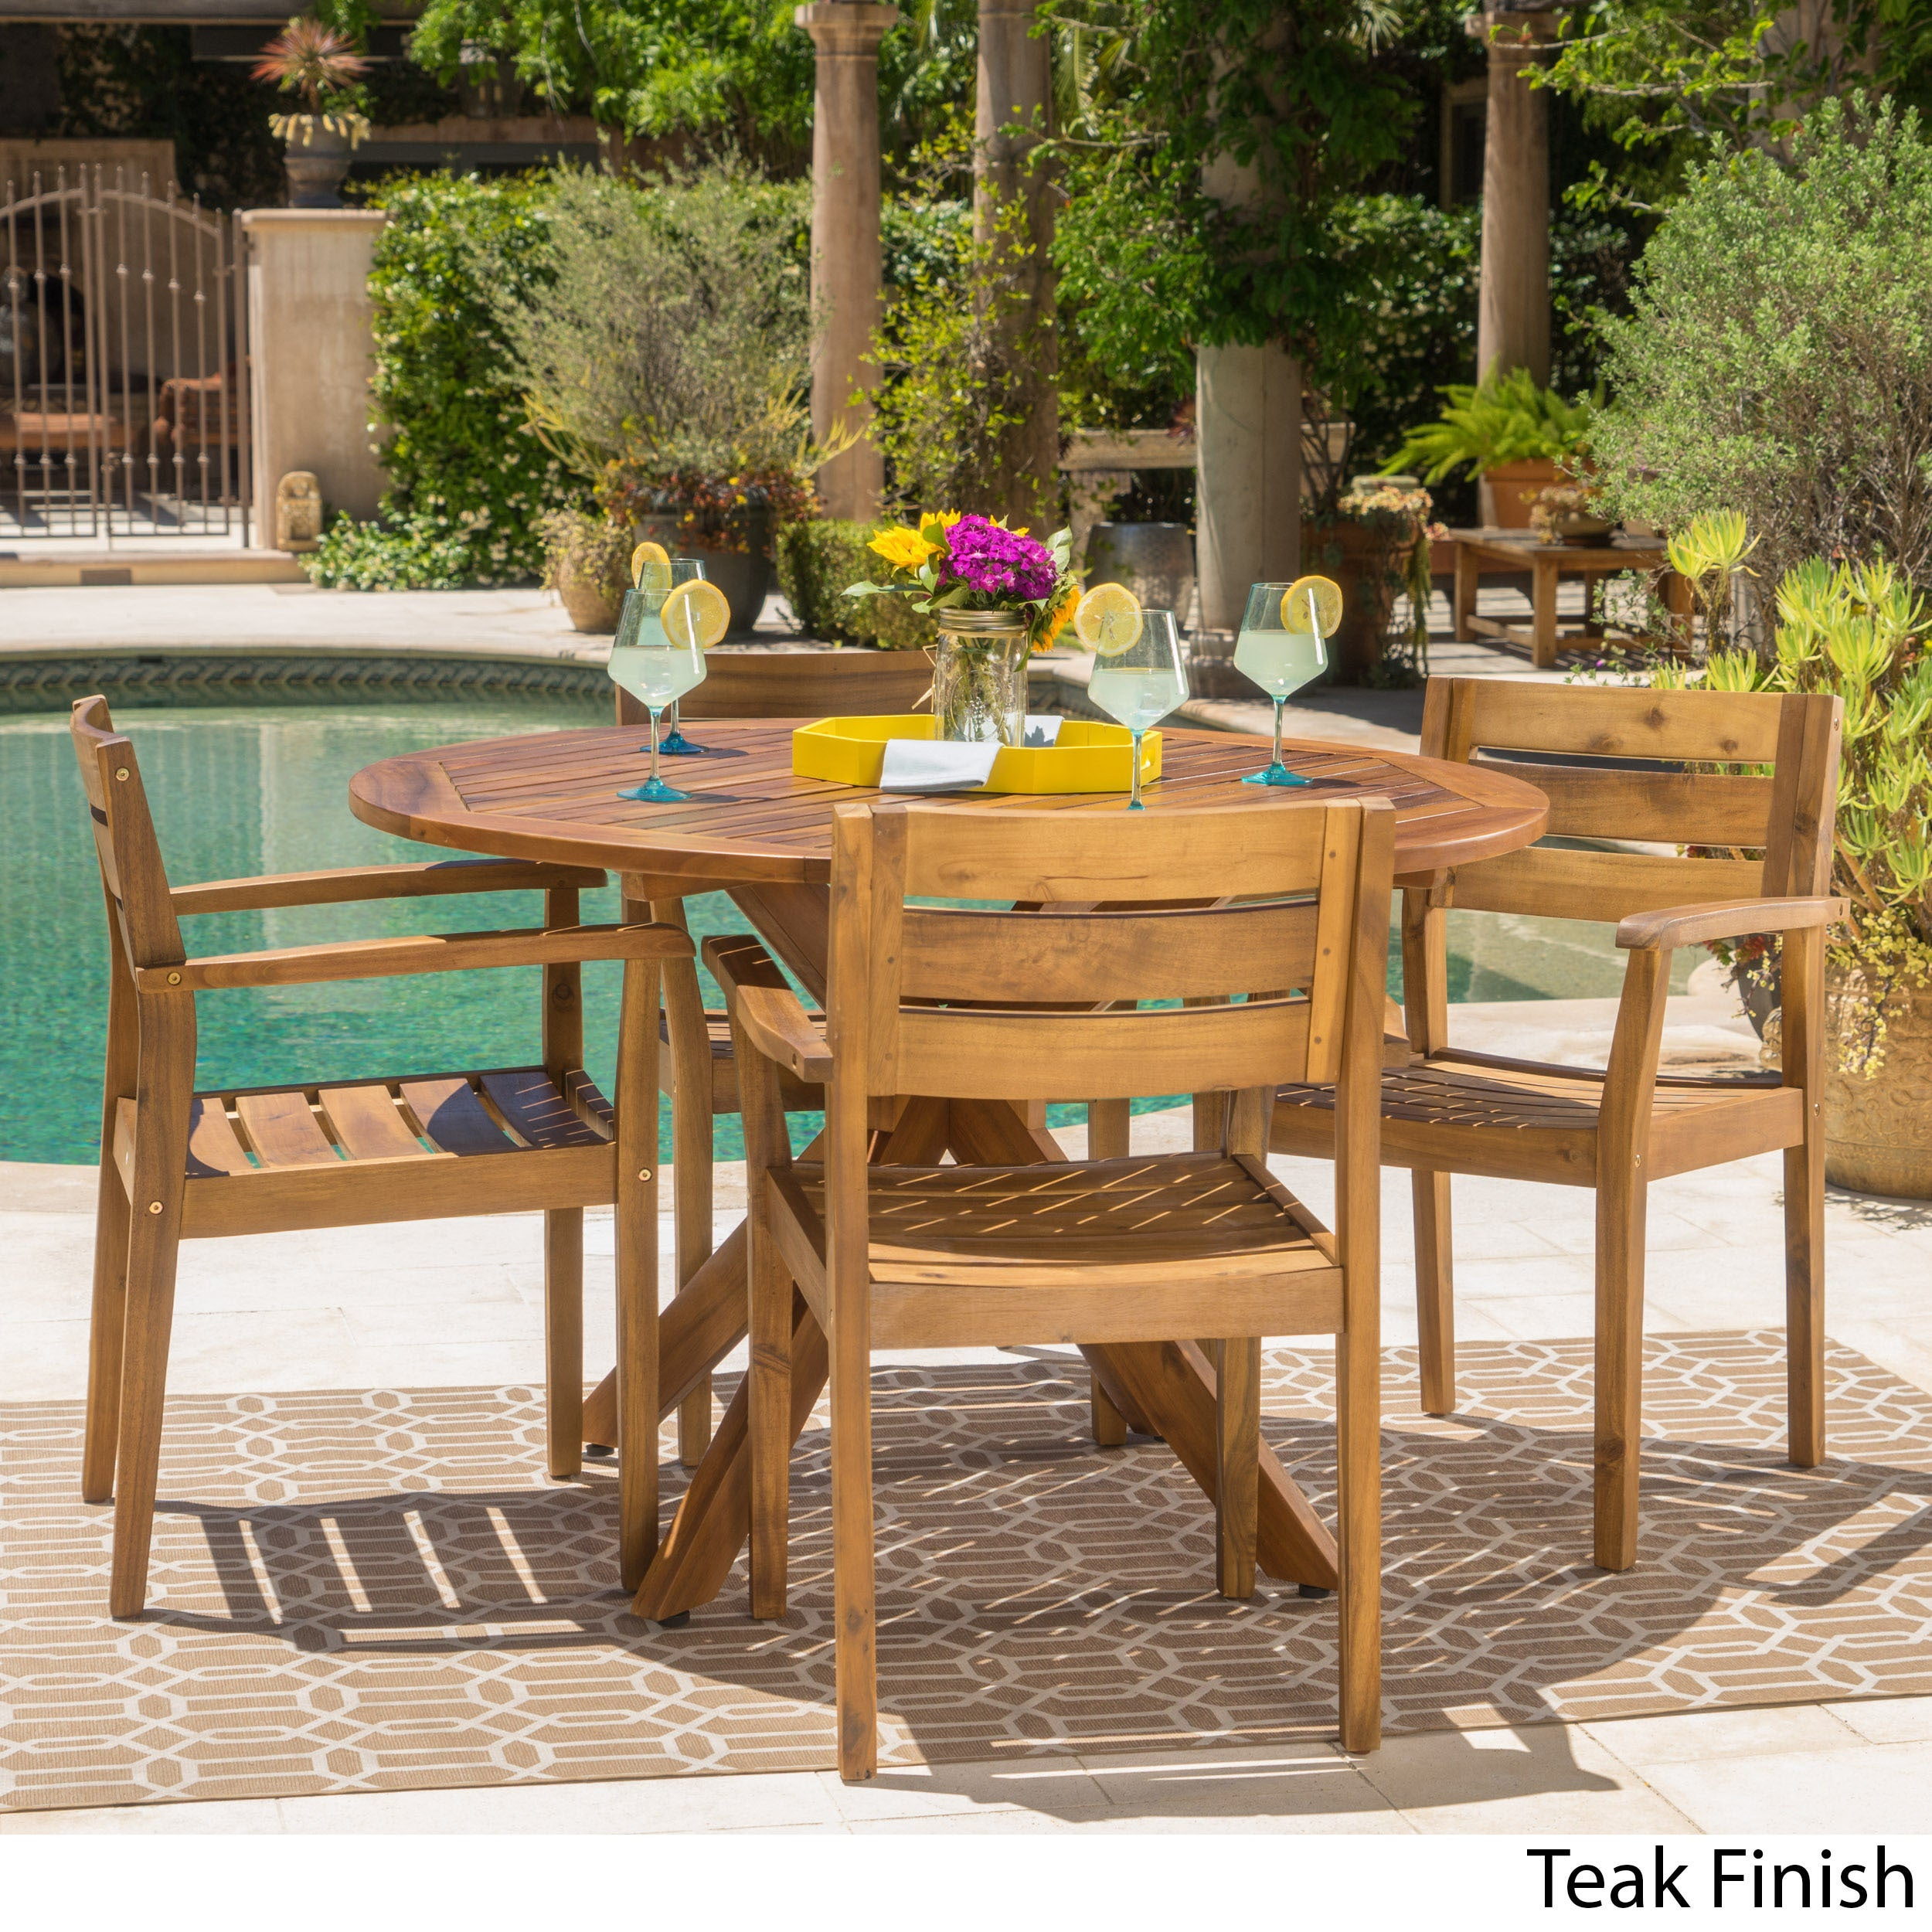 5 Piece Round Acacia Wood Dining Set